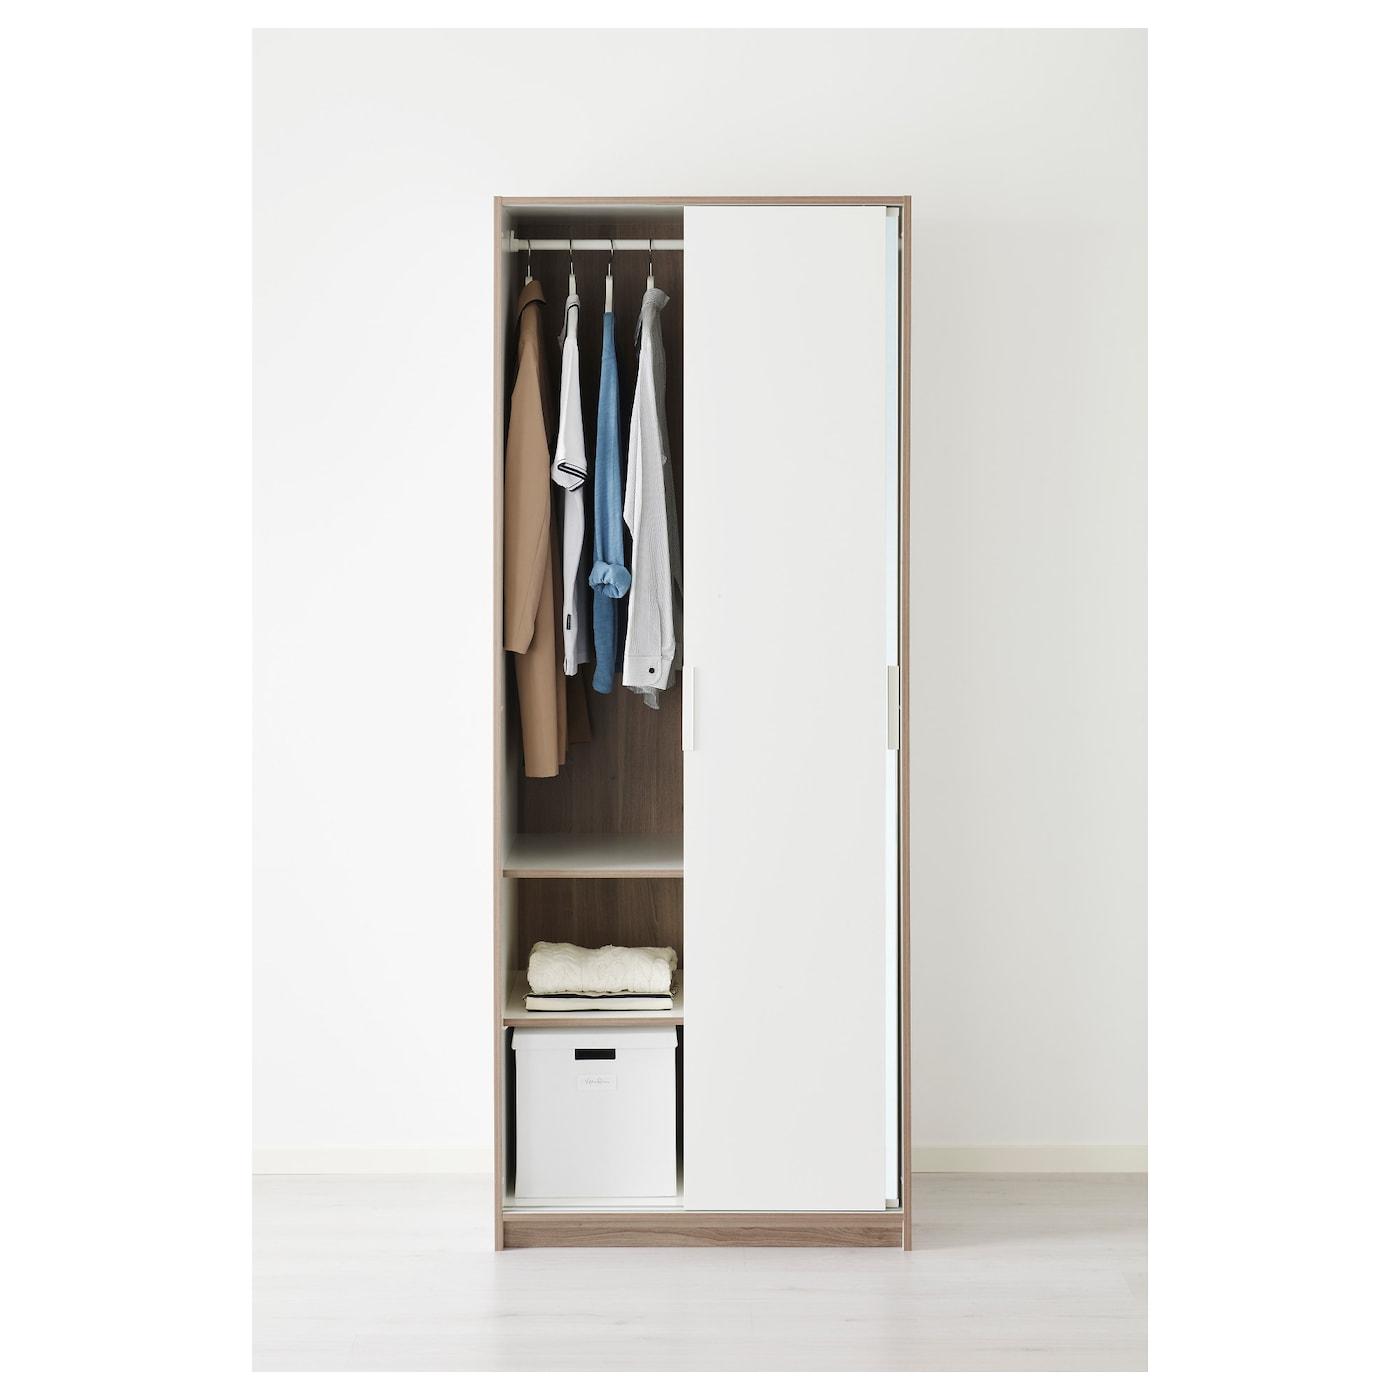 How To Make A Free Standing Wardrobe With Sliding Doors: TRYSIL Wardrobe White/mirror Glass 79 X 61 X 202 Cm